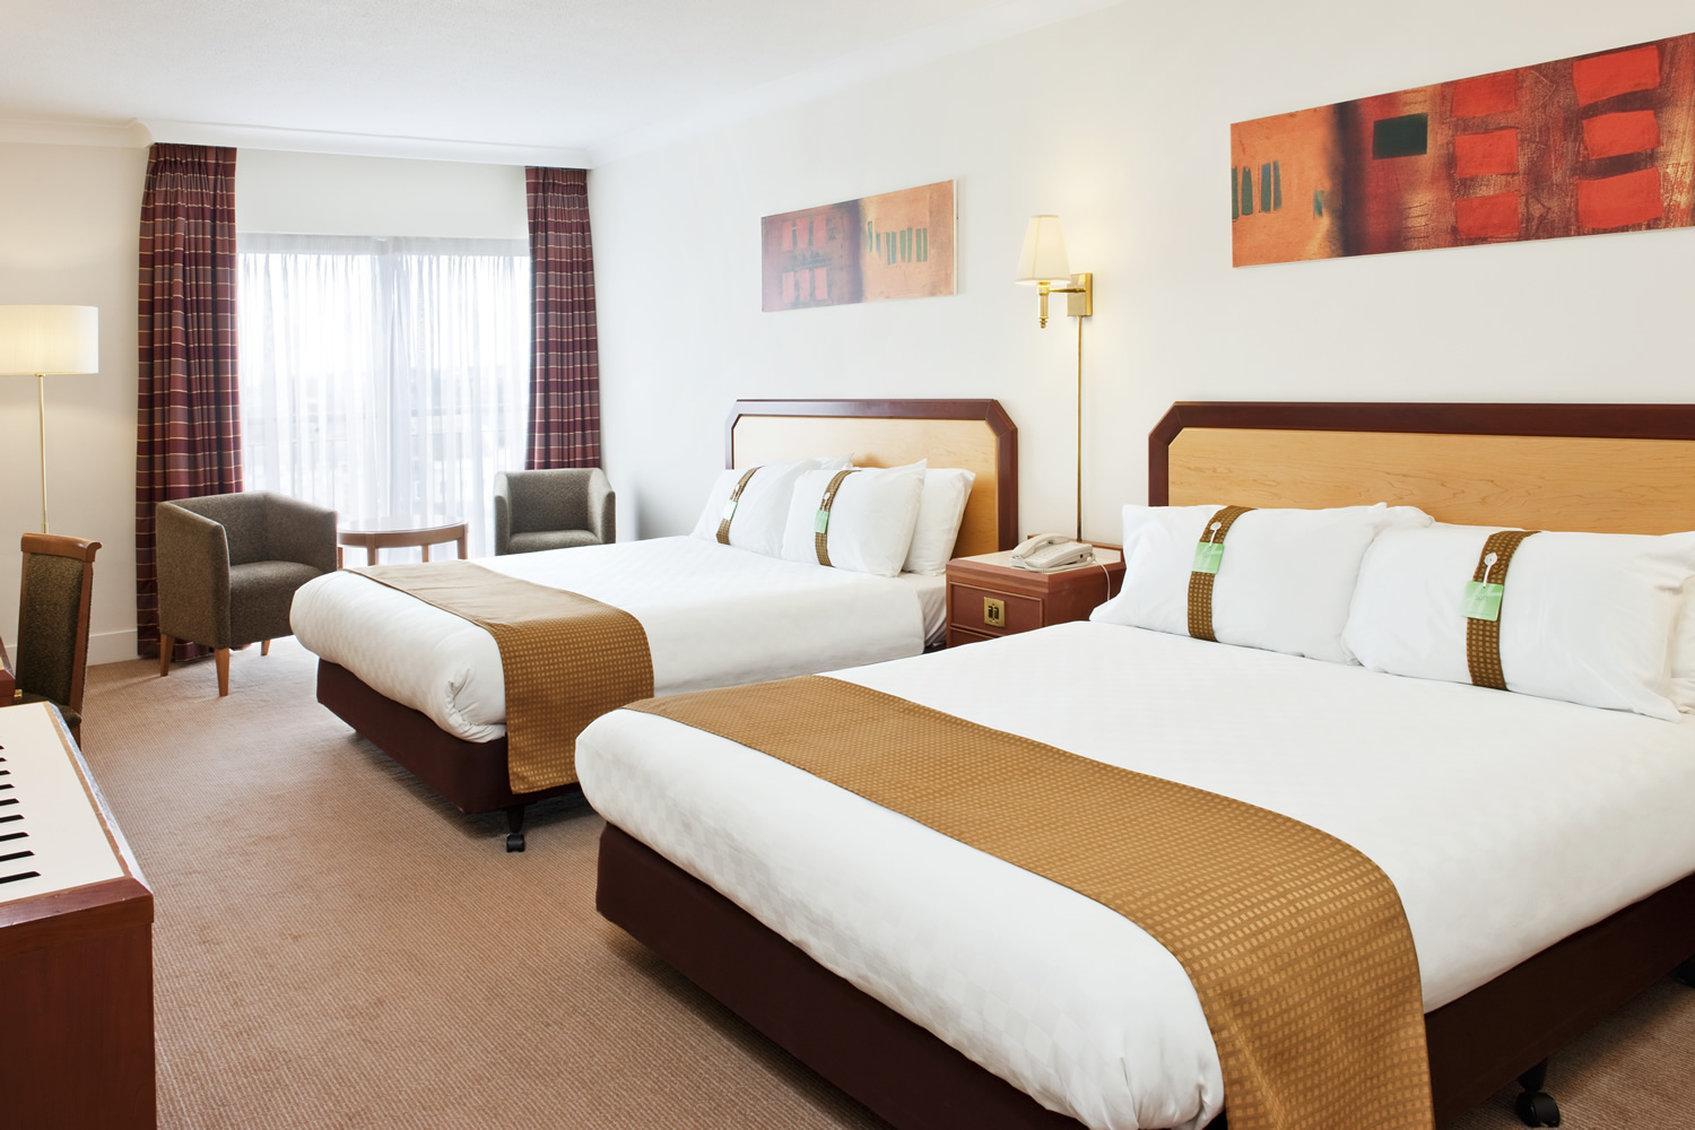 Holiday Inn Plymouth